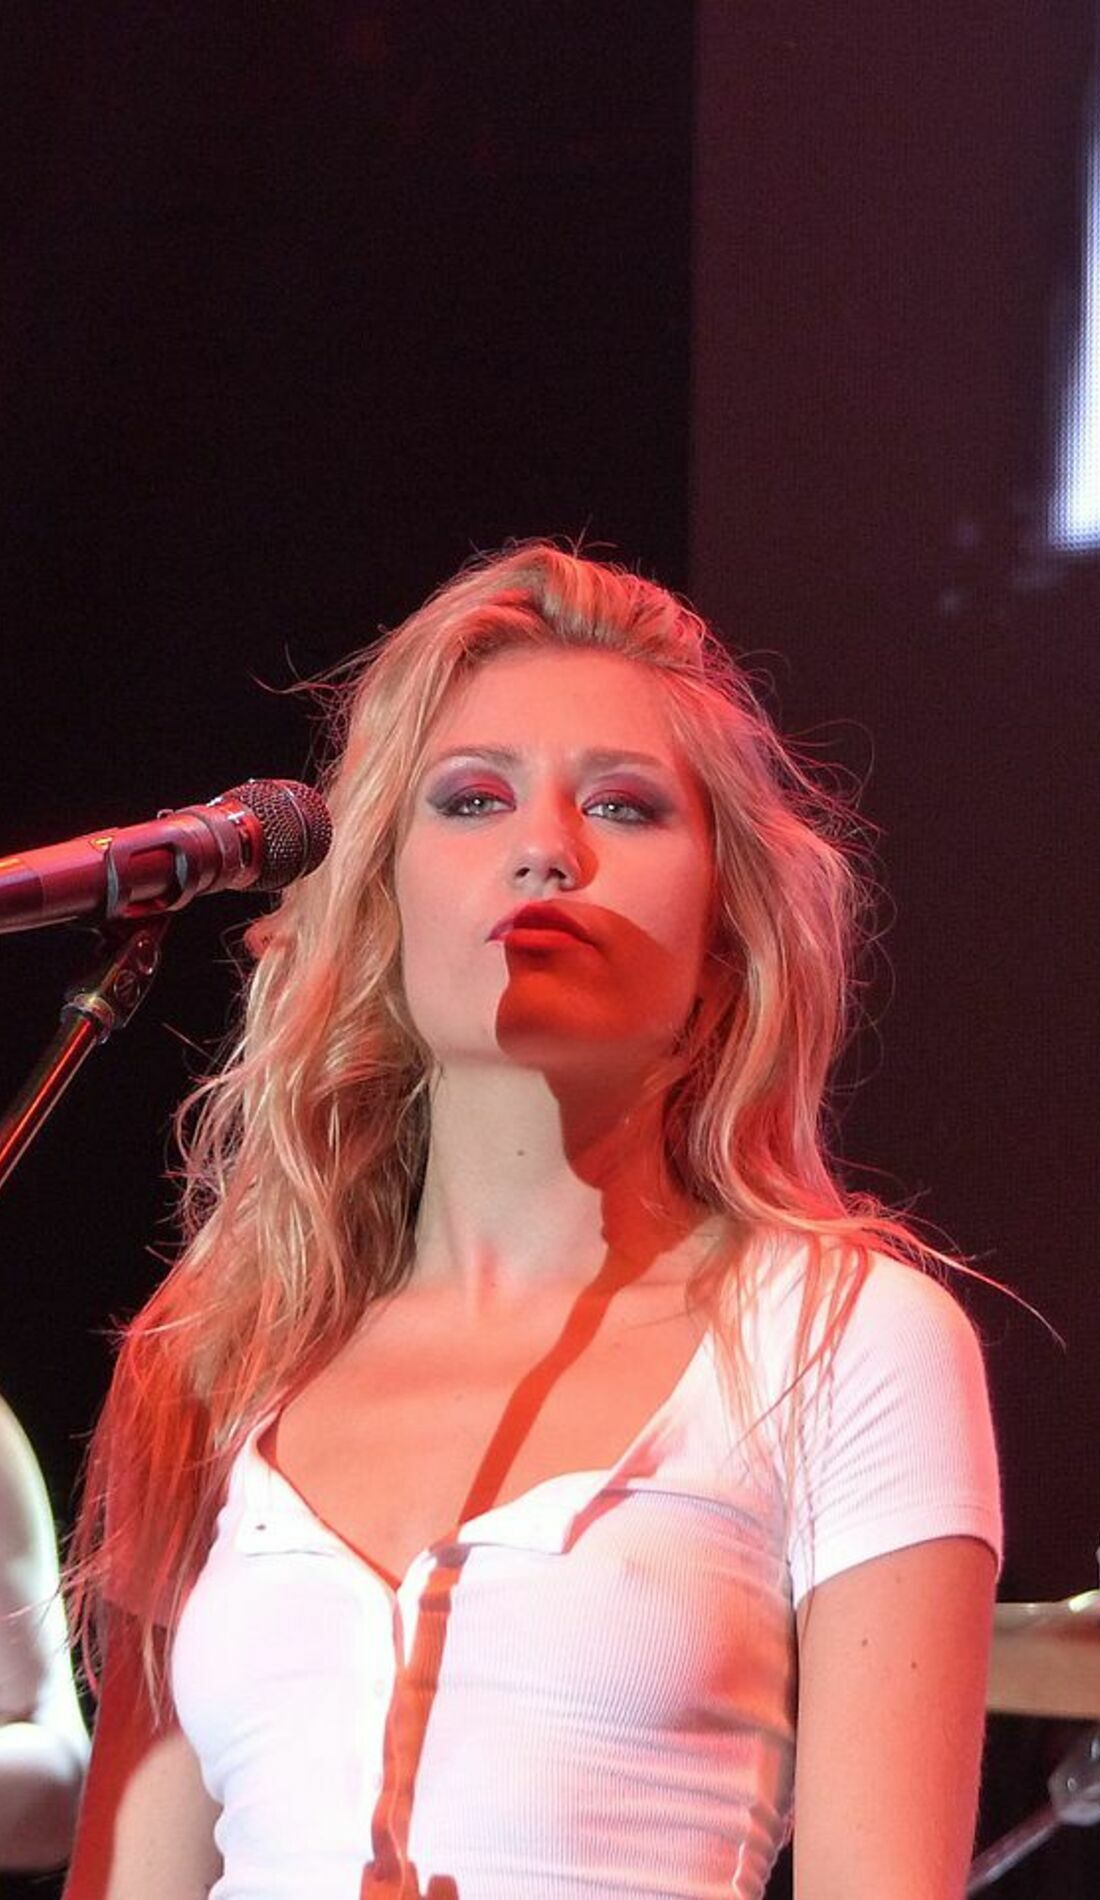 A Leningrad live event